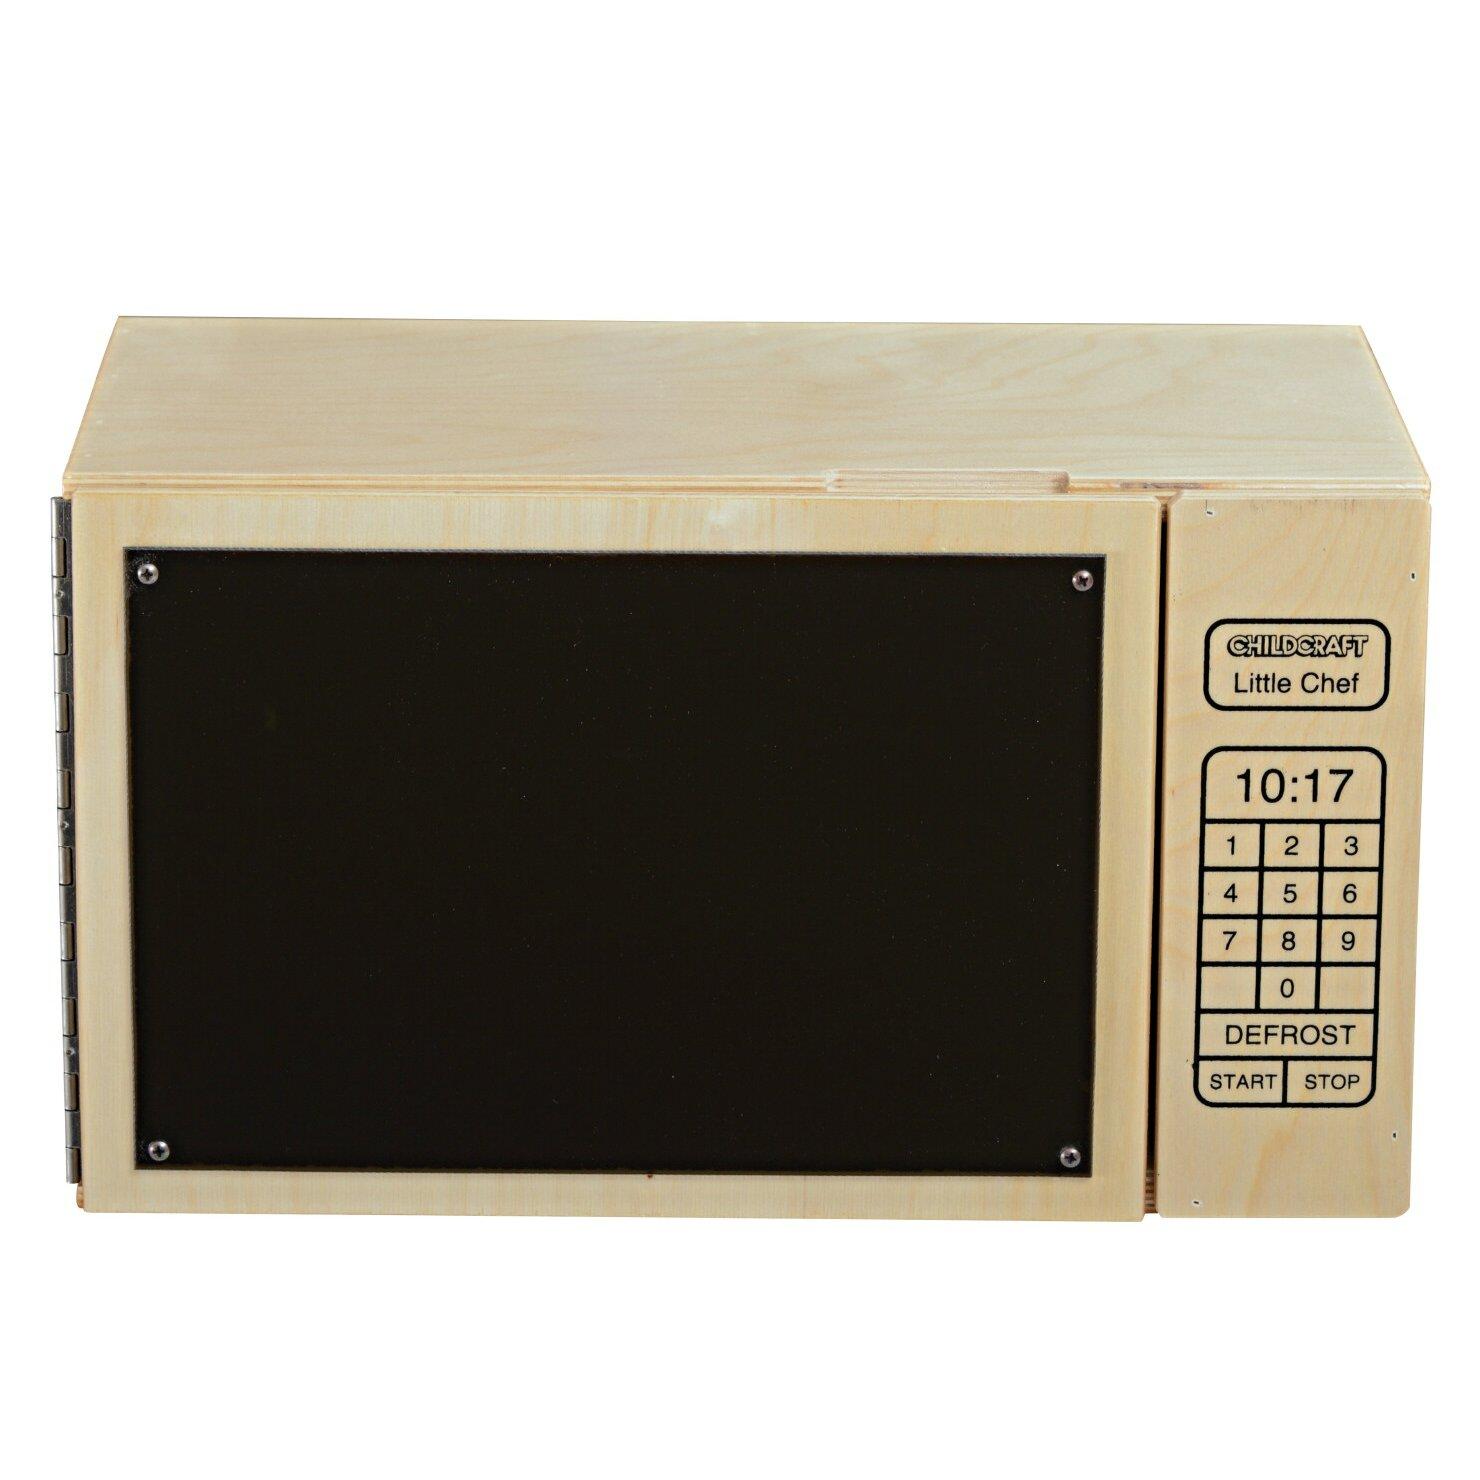 Childcraft kitchen play little chef microwave oven wayfair for Child craft play kitchen